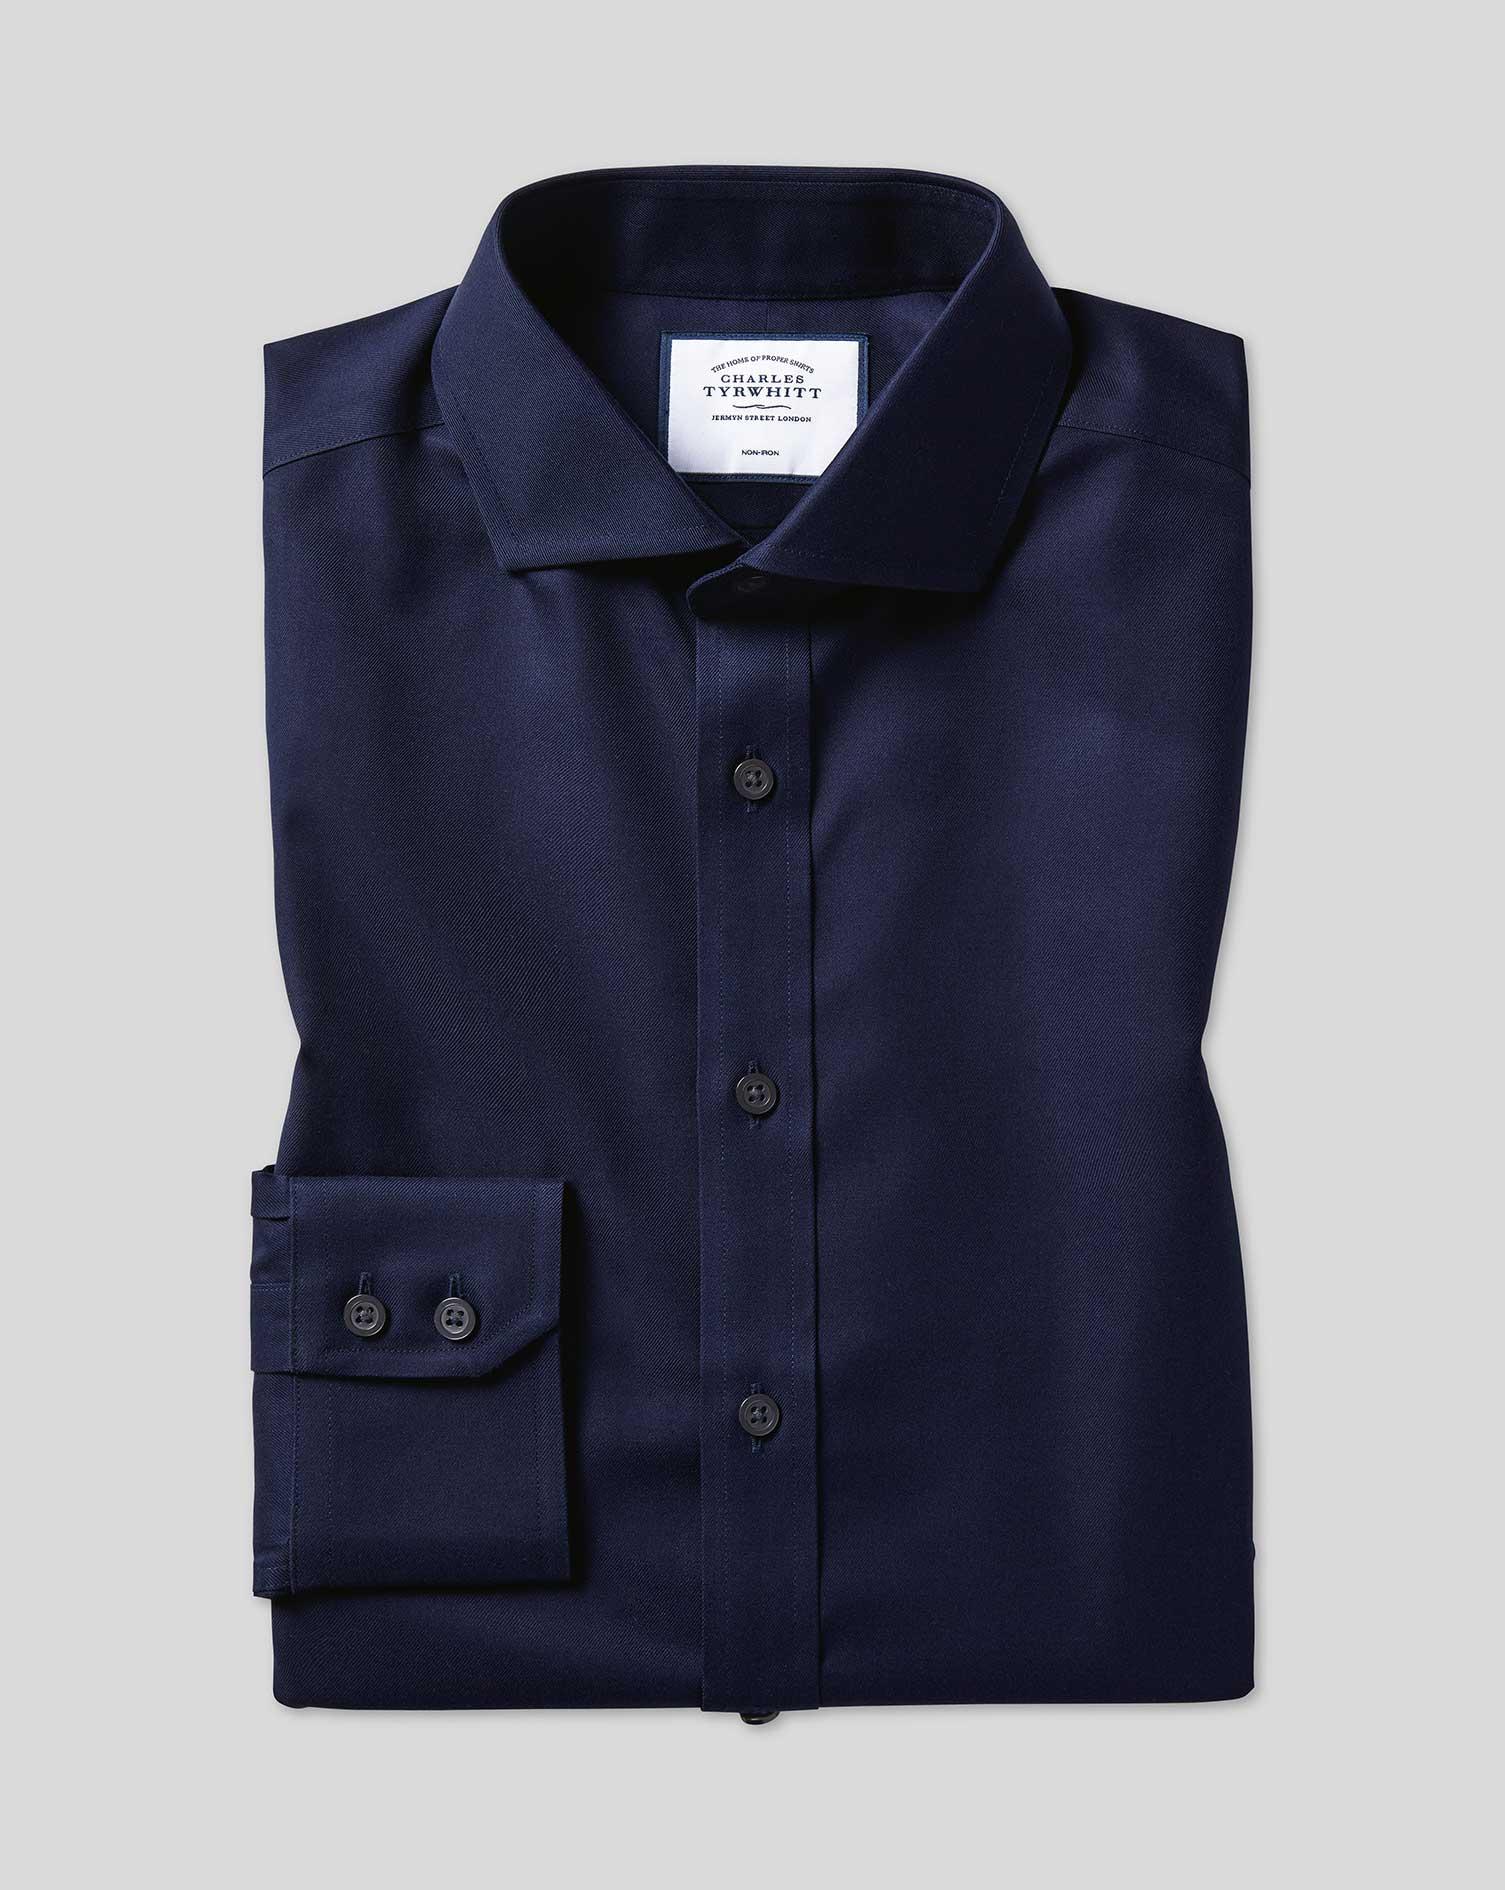 Cotton Slim Fit Navy Cutaway Non-Iron Twill Shirt